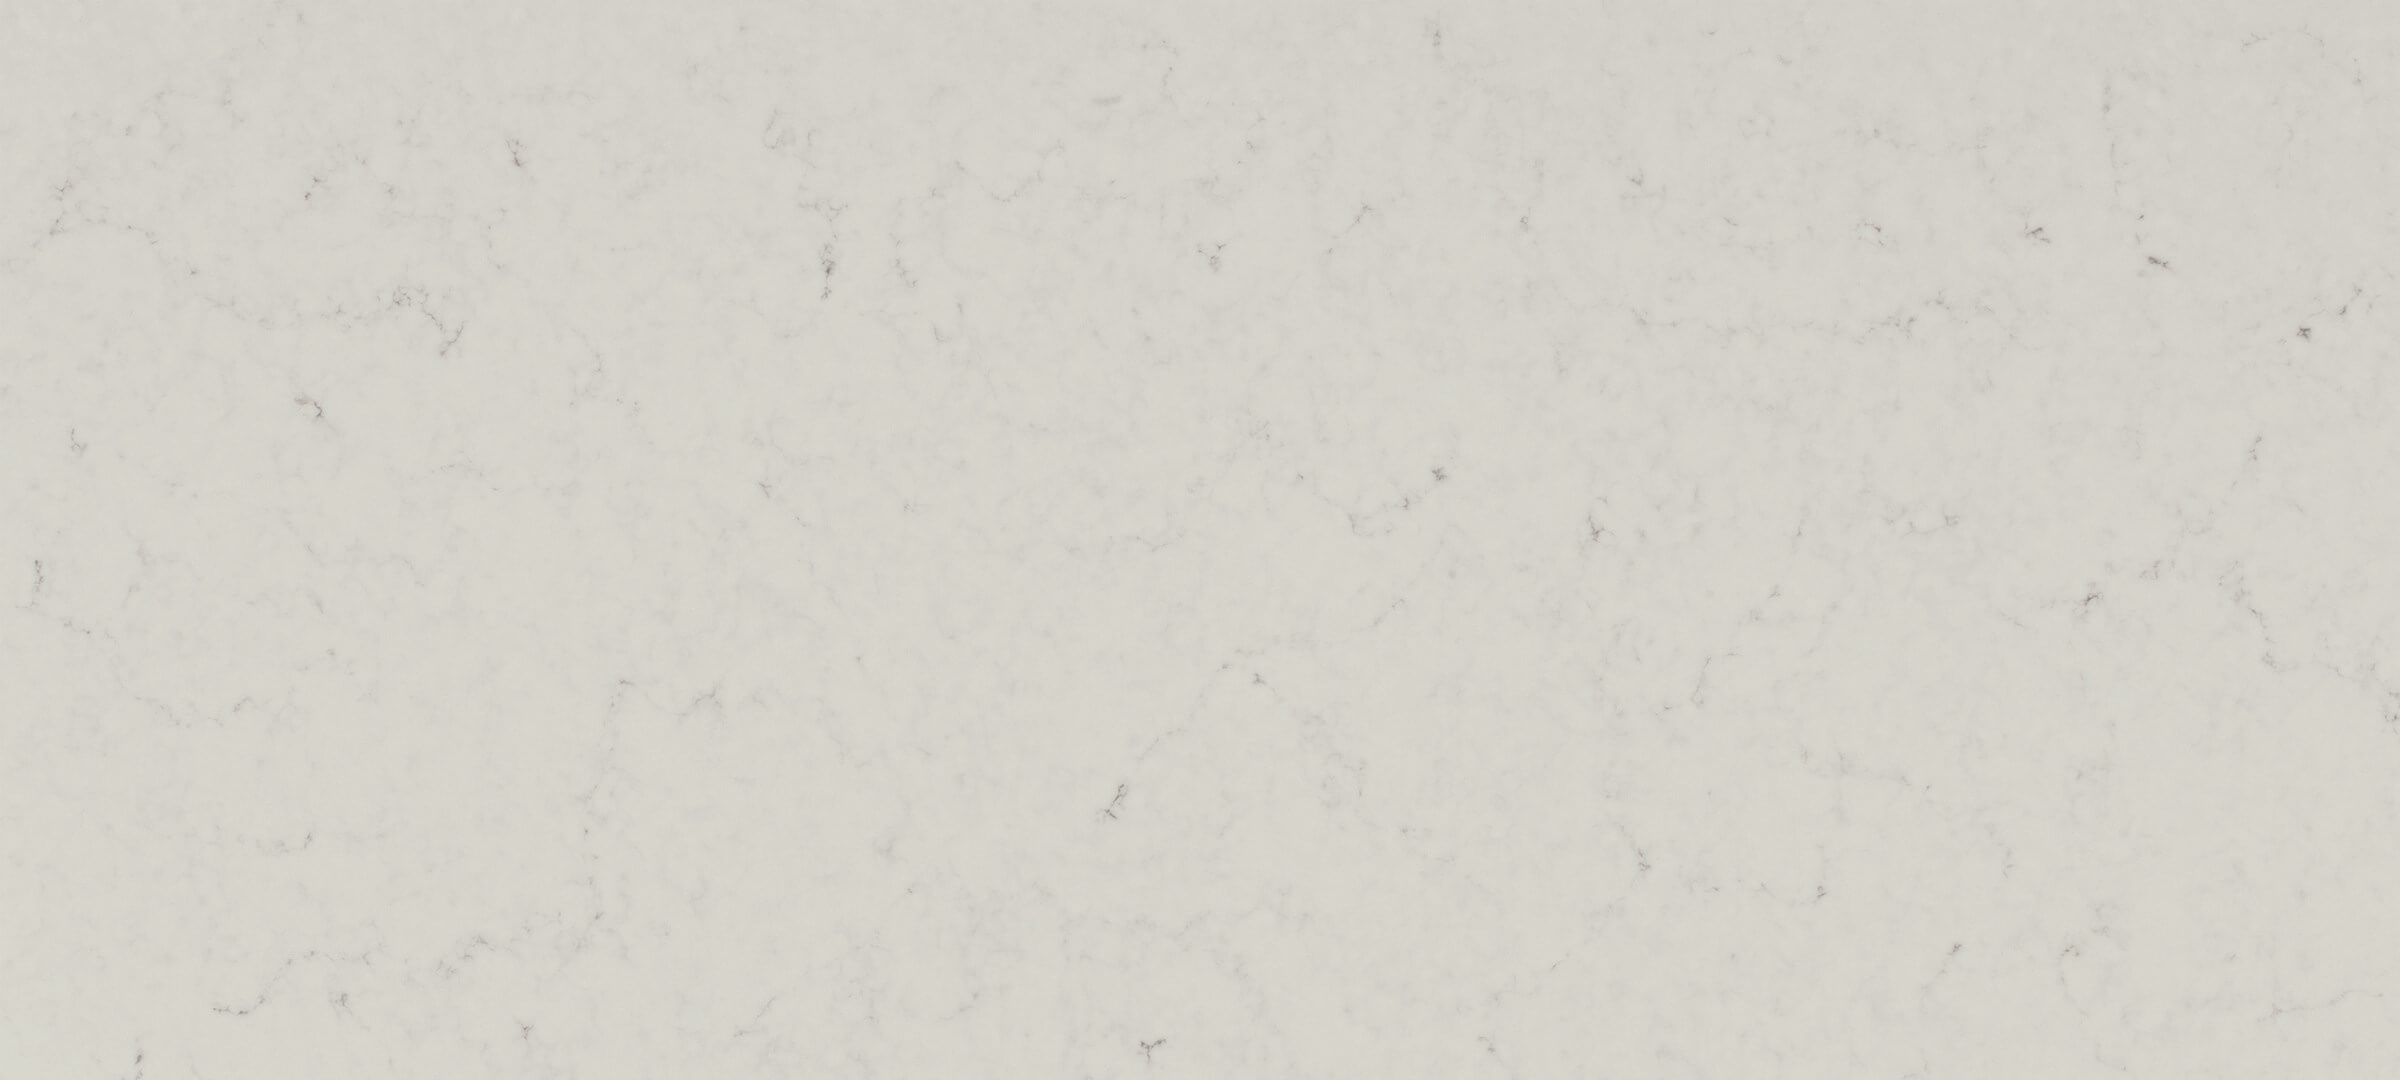 london grey quartz granite countertops michigan near me detroit stone 586 244 4084. Black Bedroom Furniture Sets. Home Design Ideas